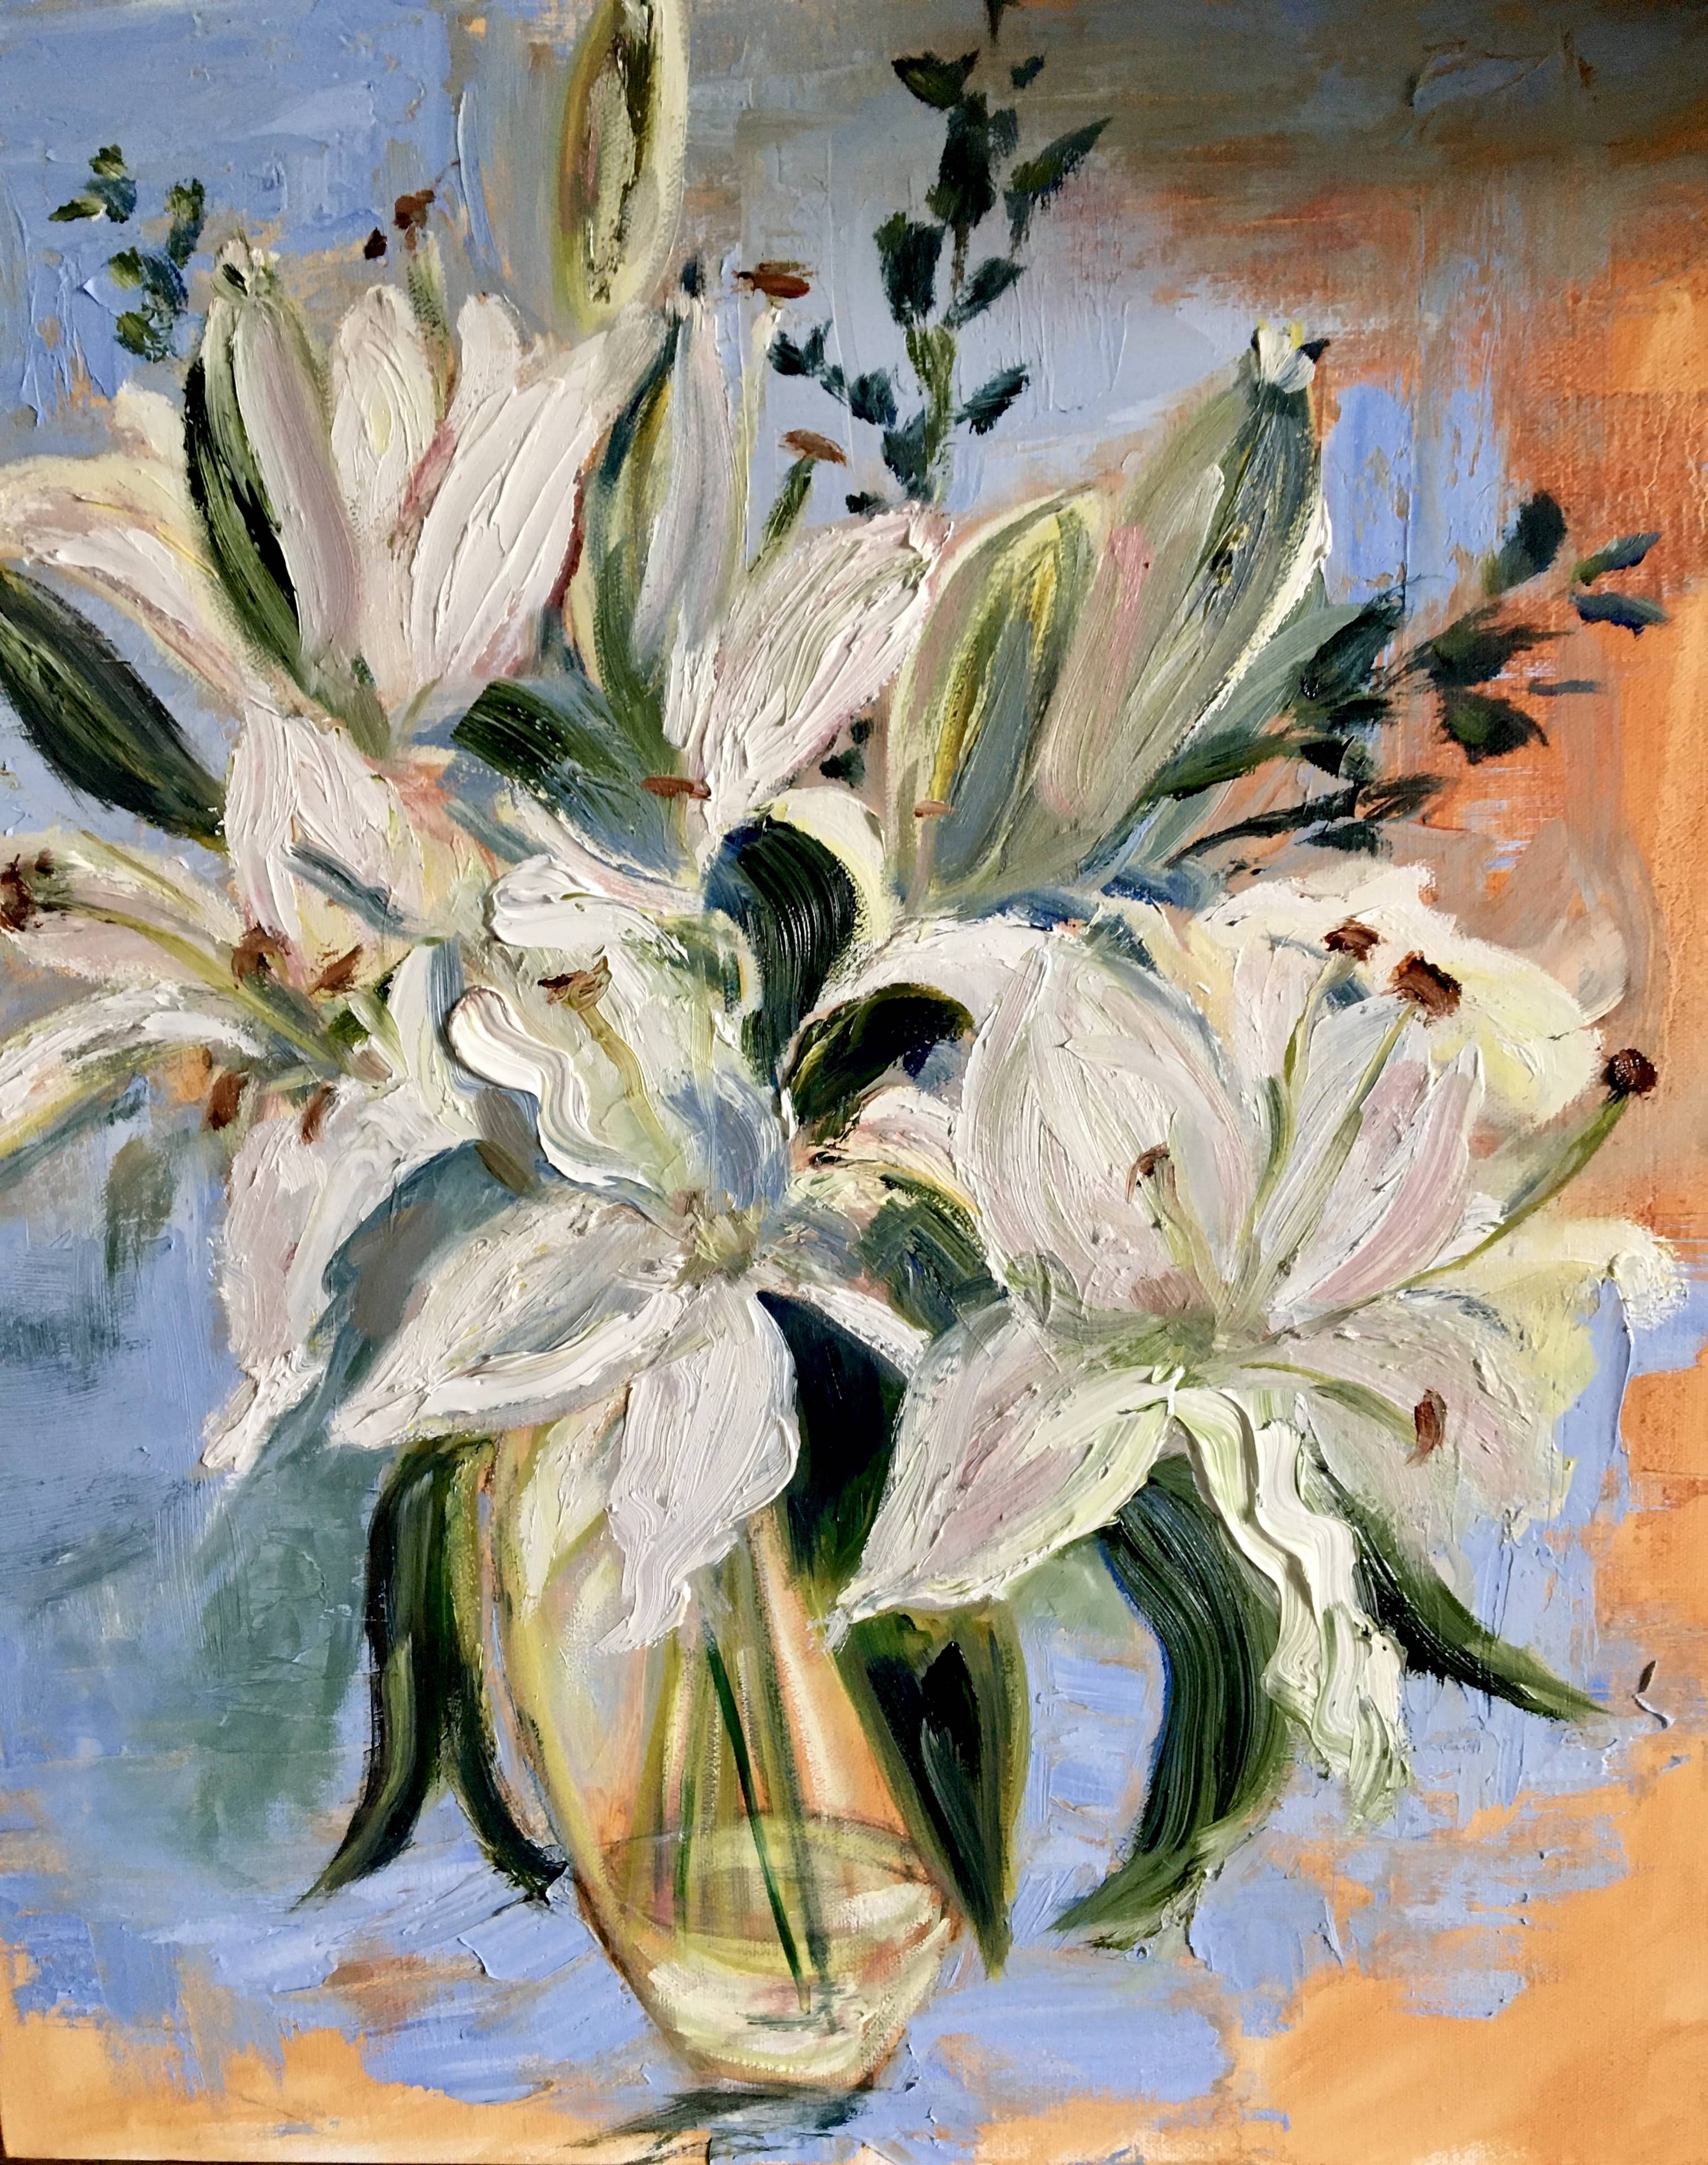 impasto oil painting still life white lillies in glass vase